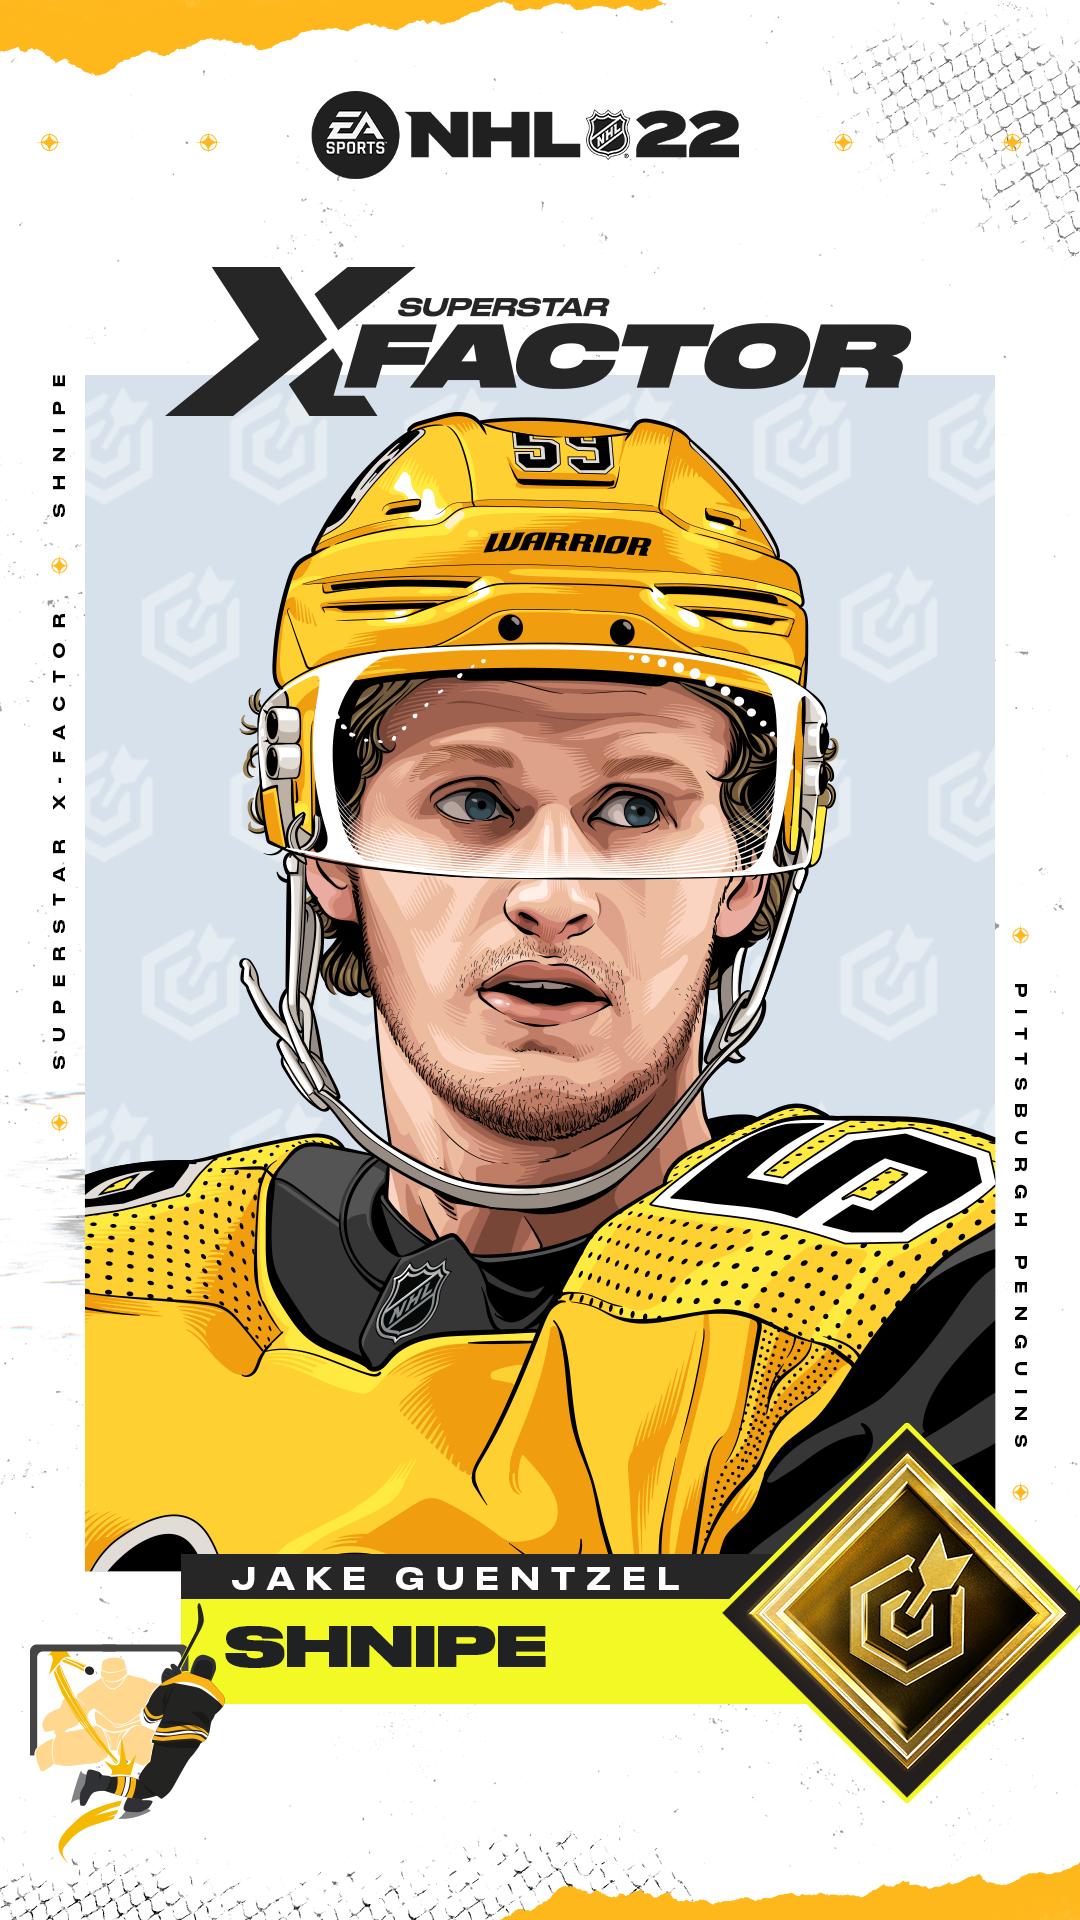 NHL22_XFactor_JJakeGuentzel_9x16